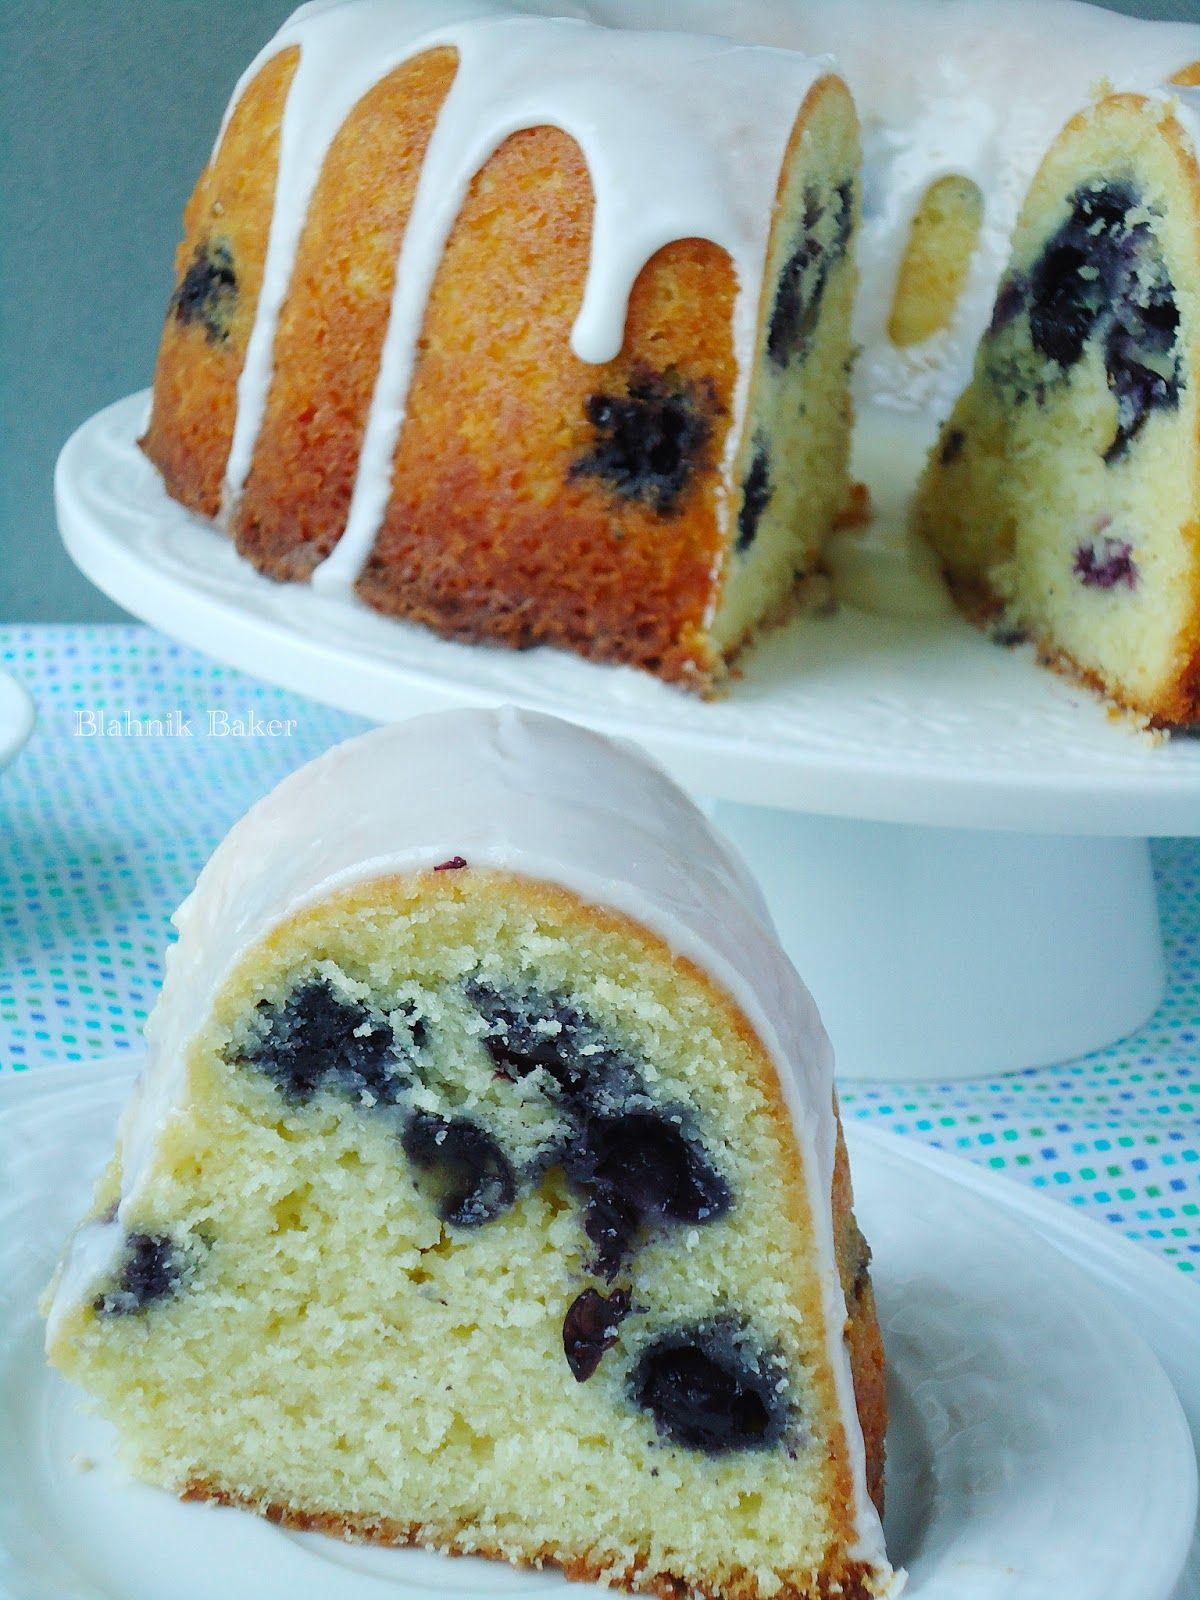 Blueberry buttermilk bundt cake with lemon glaze recipe